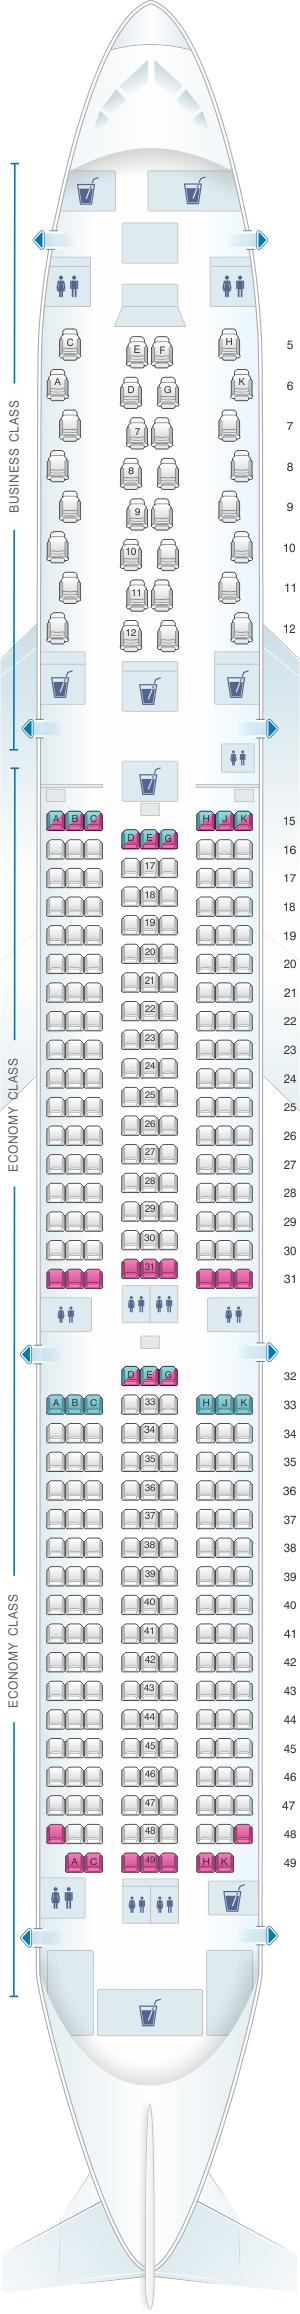 Seat map for Etihad Airways Boeing B787 10